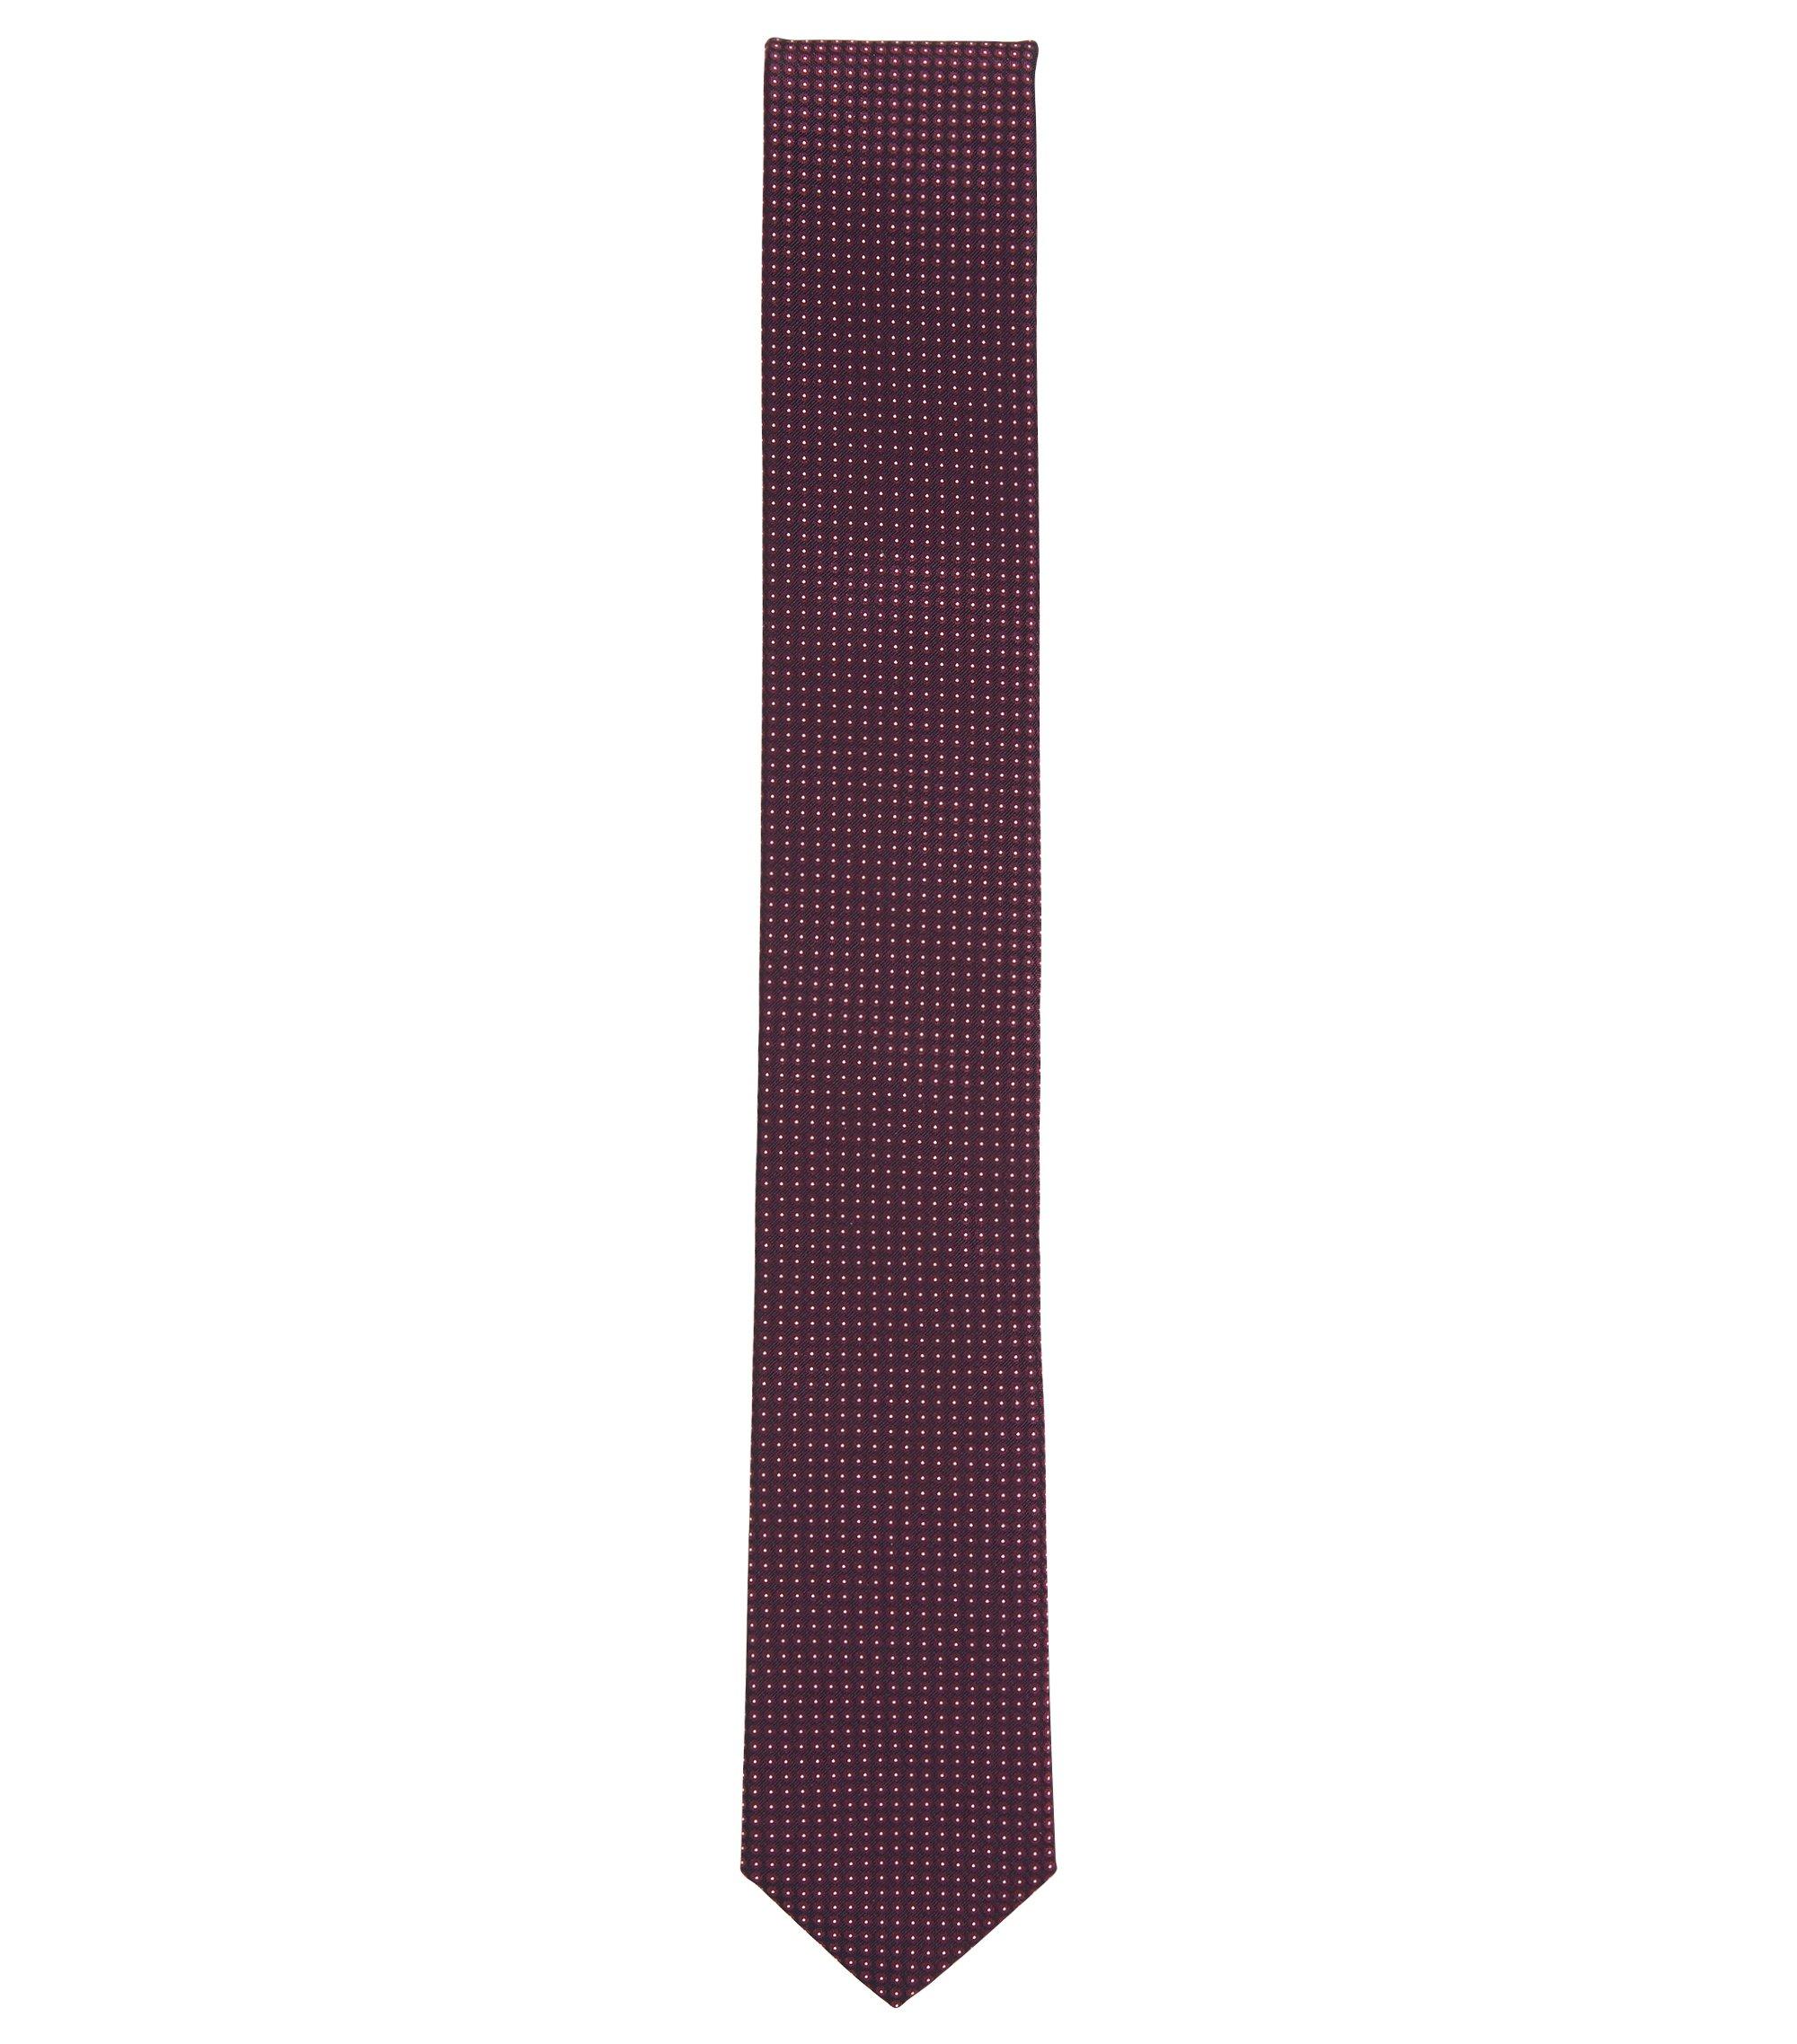 In Italien gefertigte Seidenkrawatte mit filigranem Jacquard-Muster, Dunkelrot